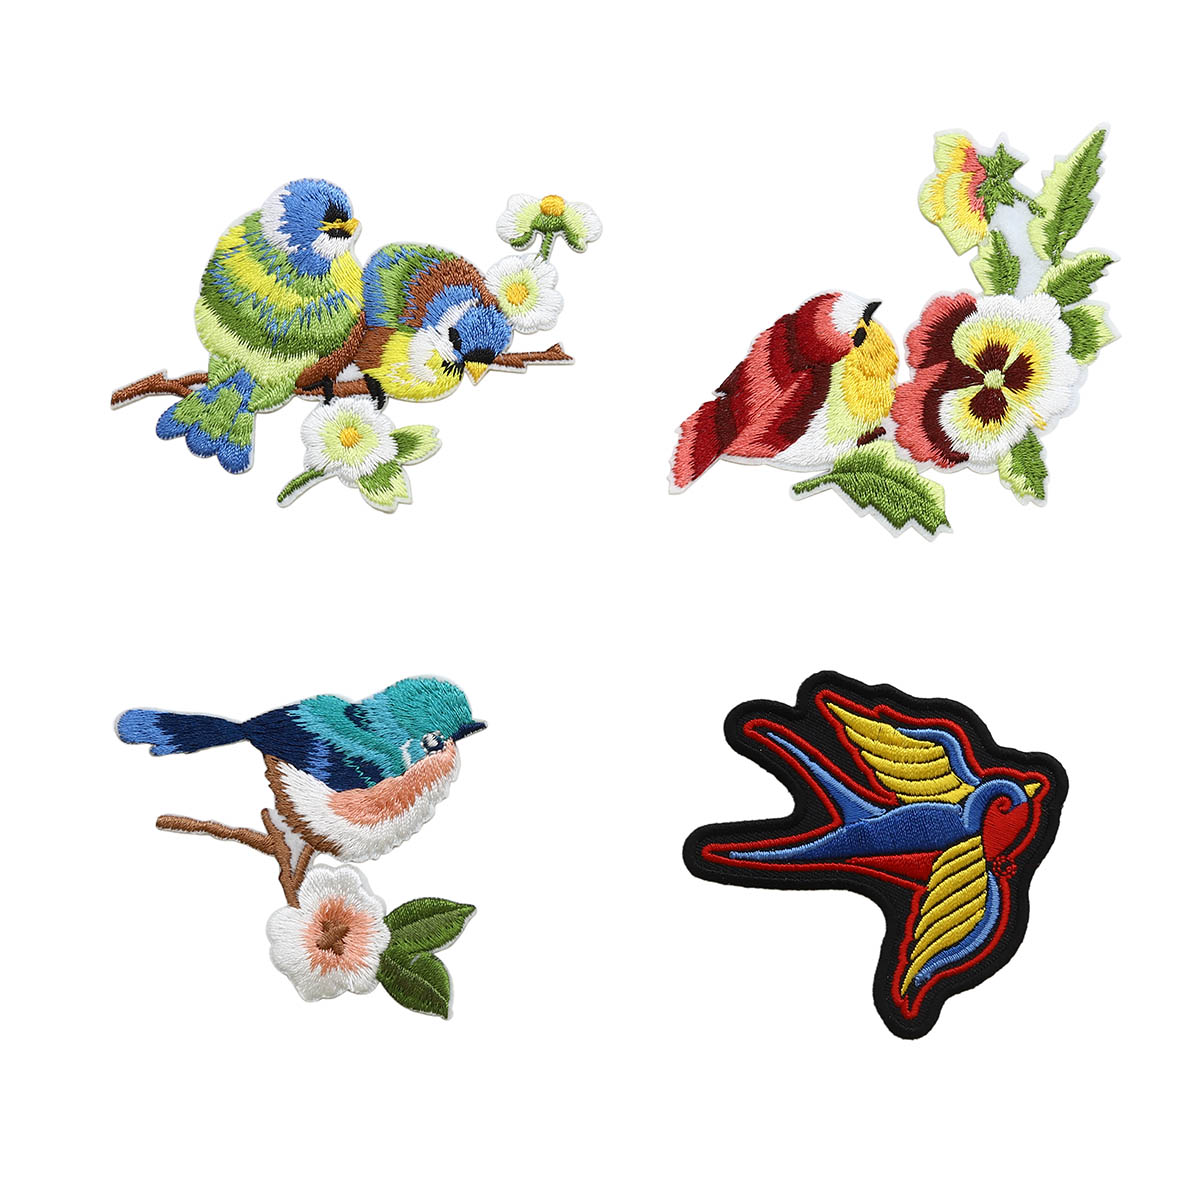 Набор термоаппликаций Птички,упак(4шт), Hobby&Pro